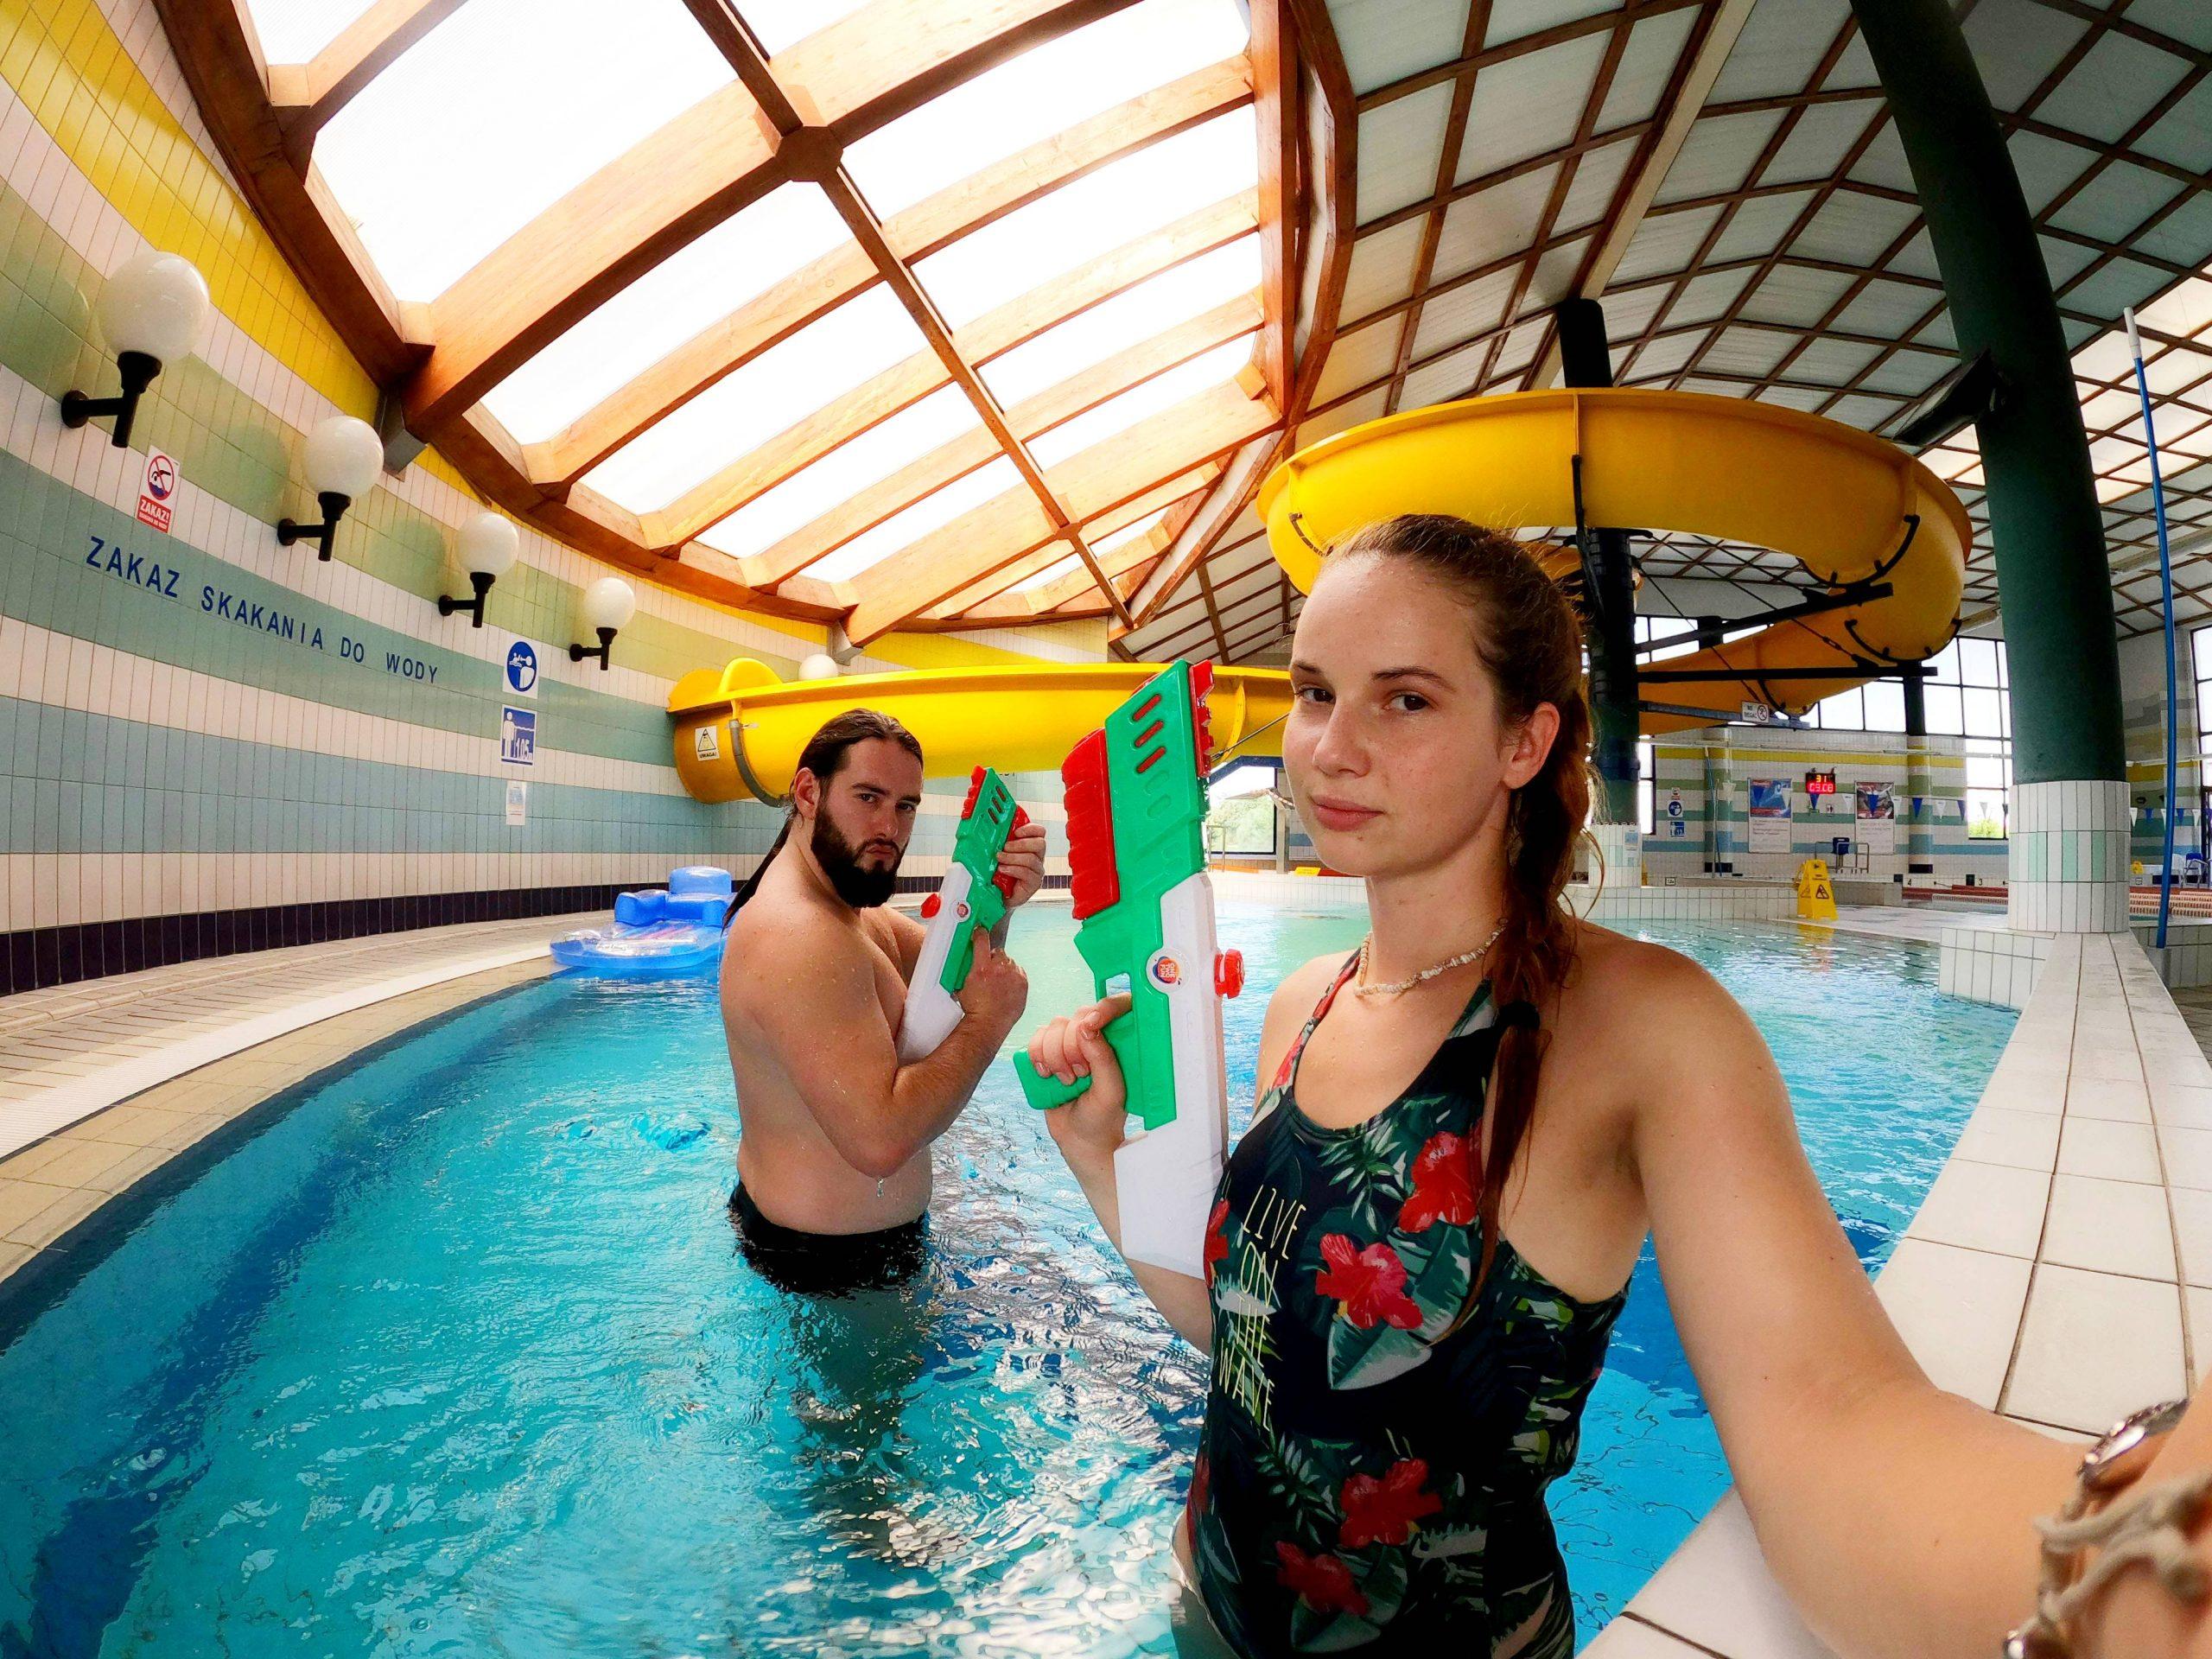 animatorzy zabawa na basenie